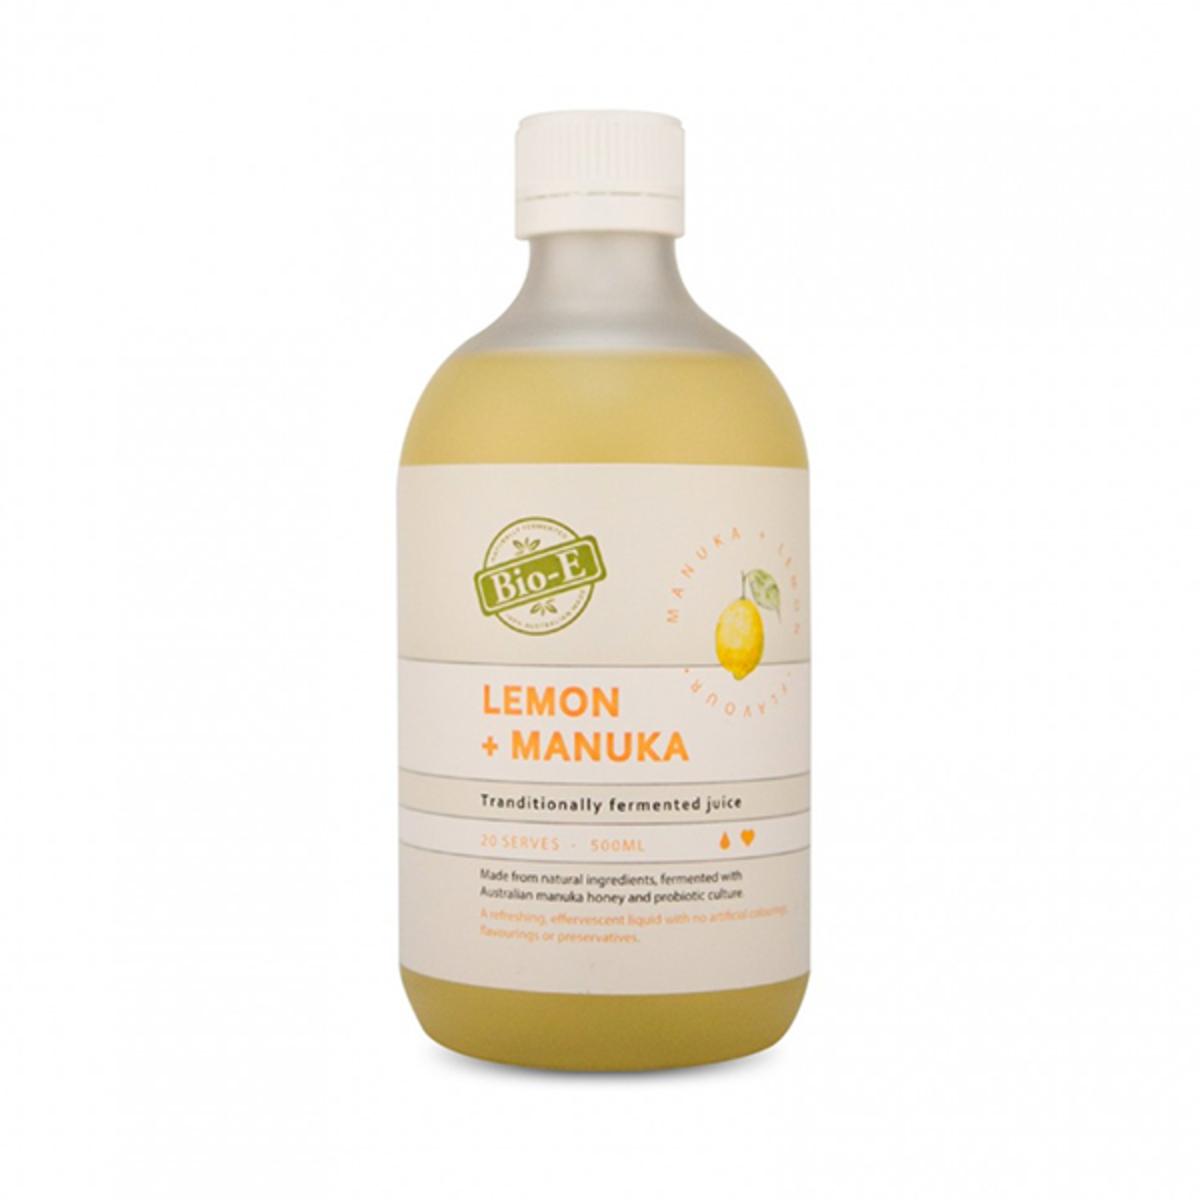 Lemon + Manuka Tranditionally Fermented Juice 500ML